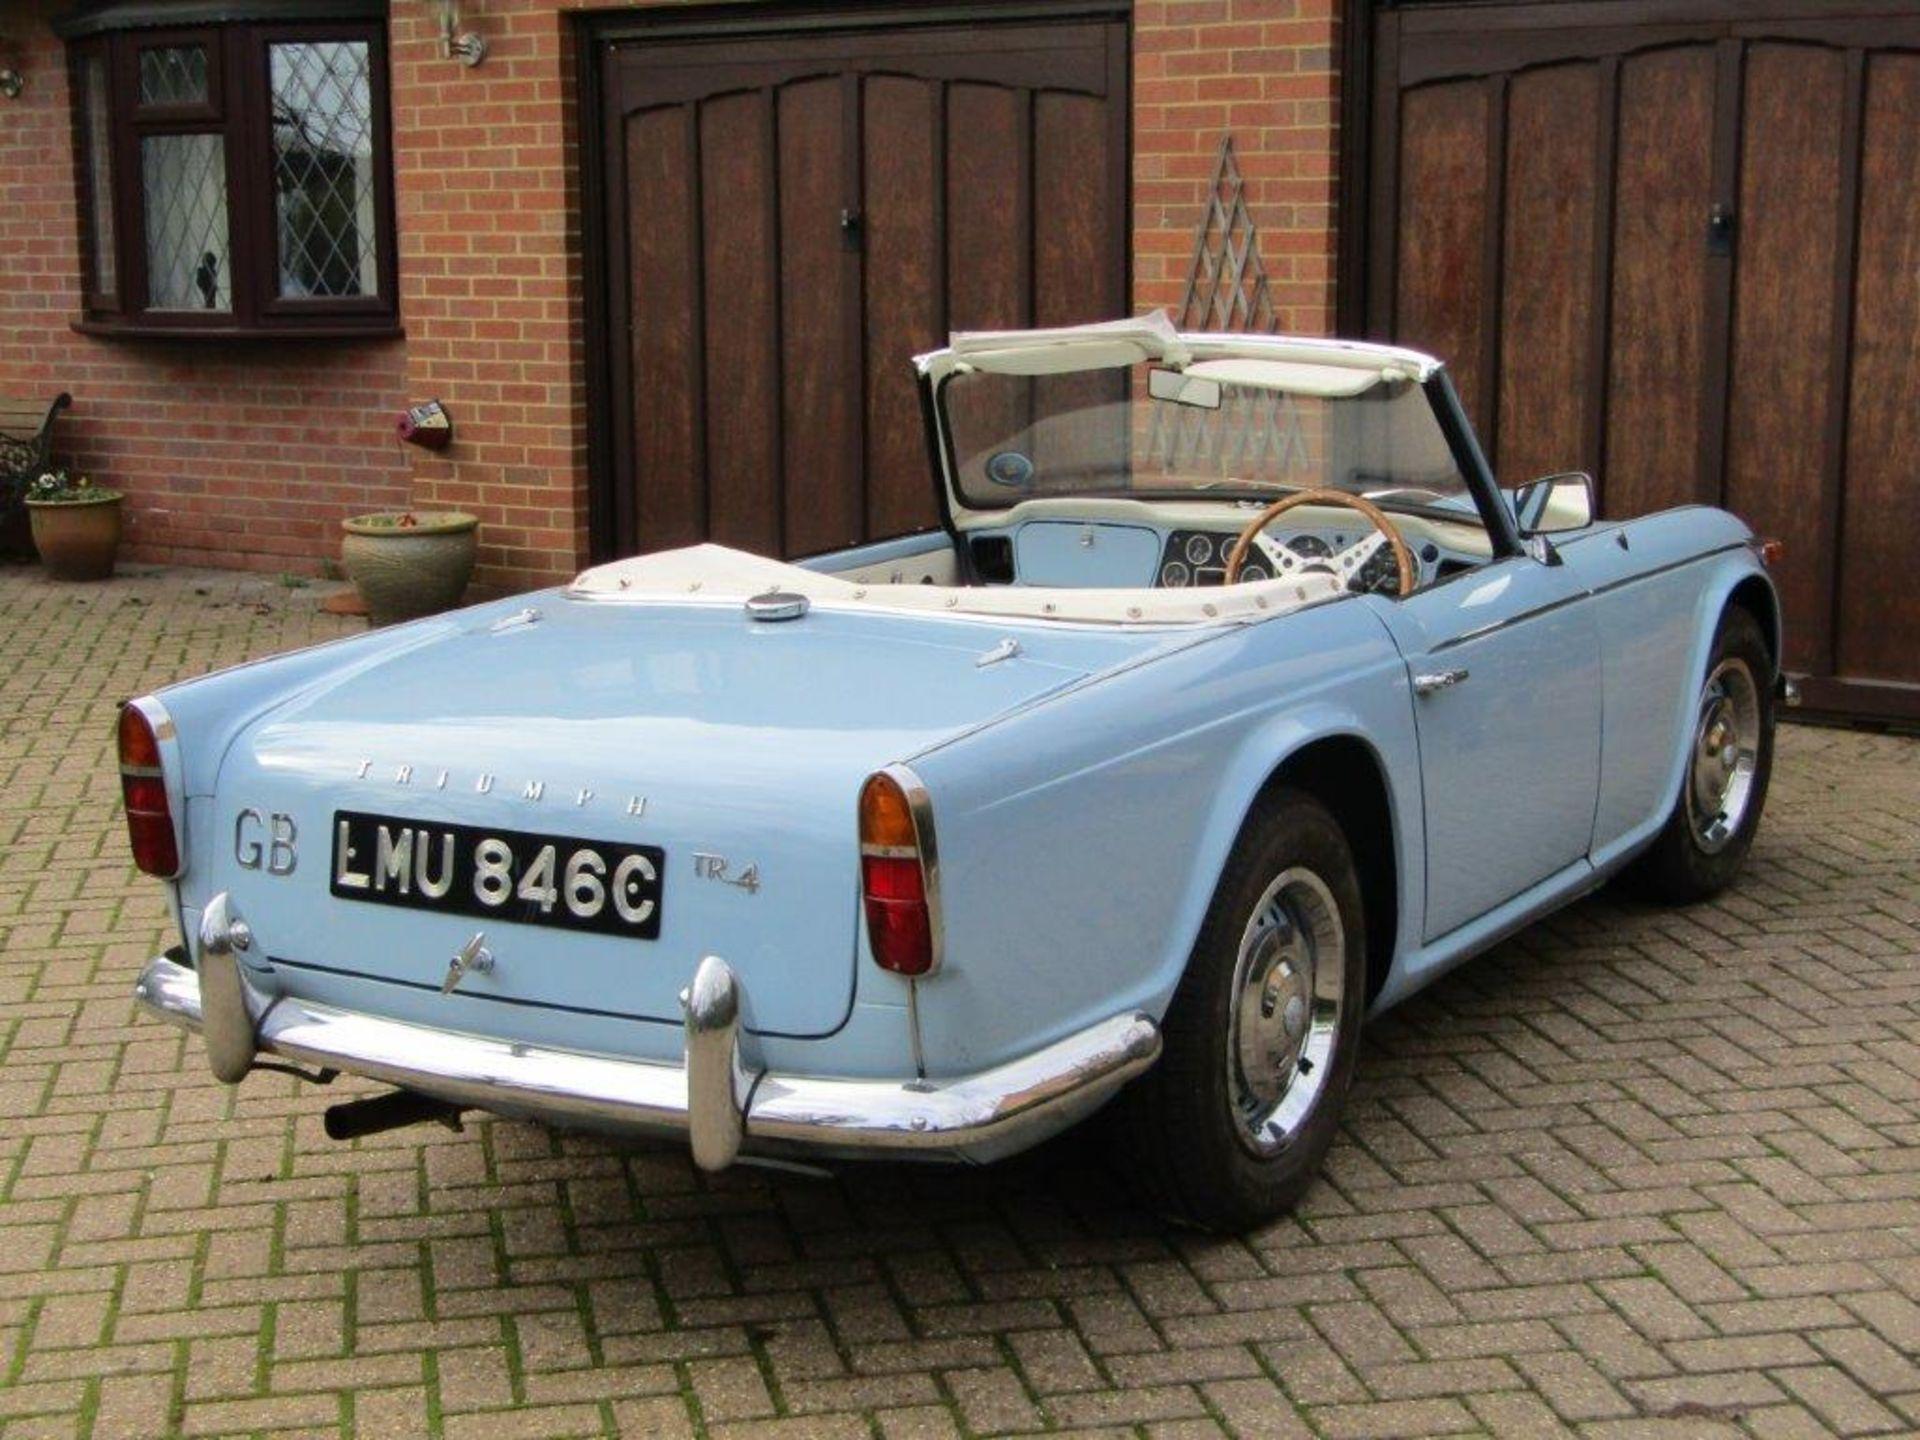 1965 Triumph TR4 - Image 2 of 17